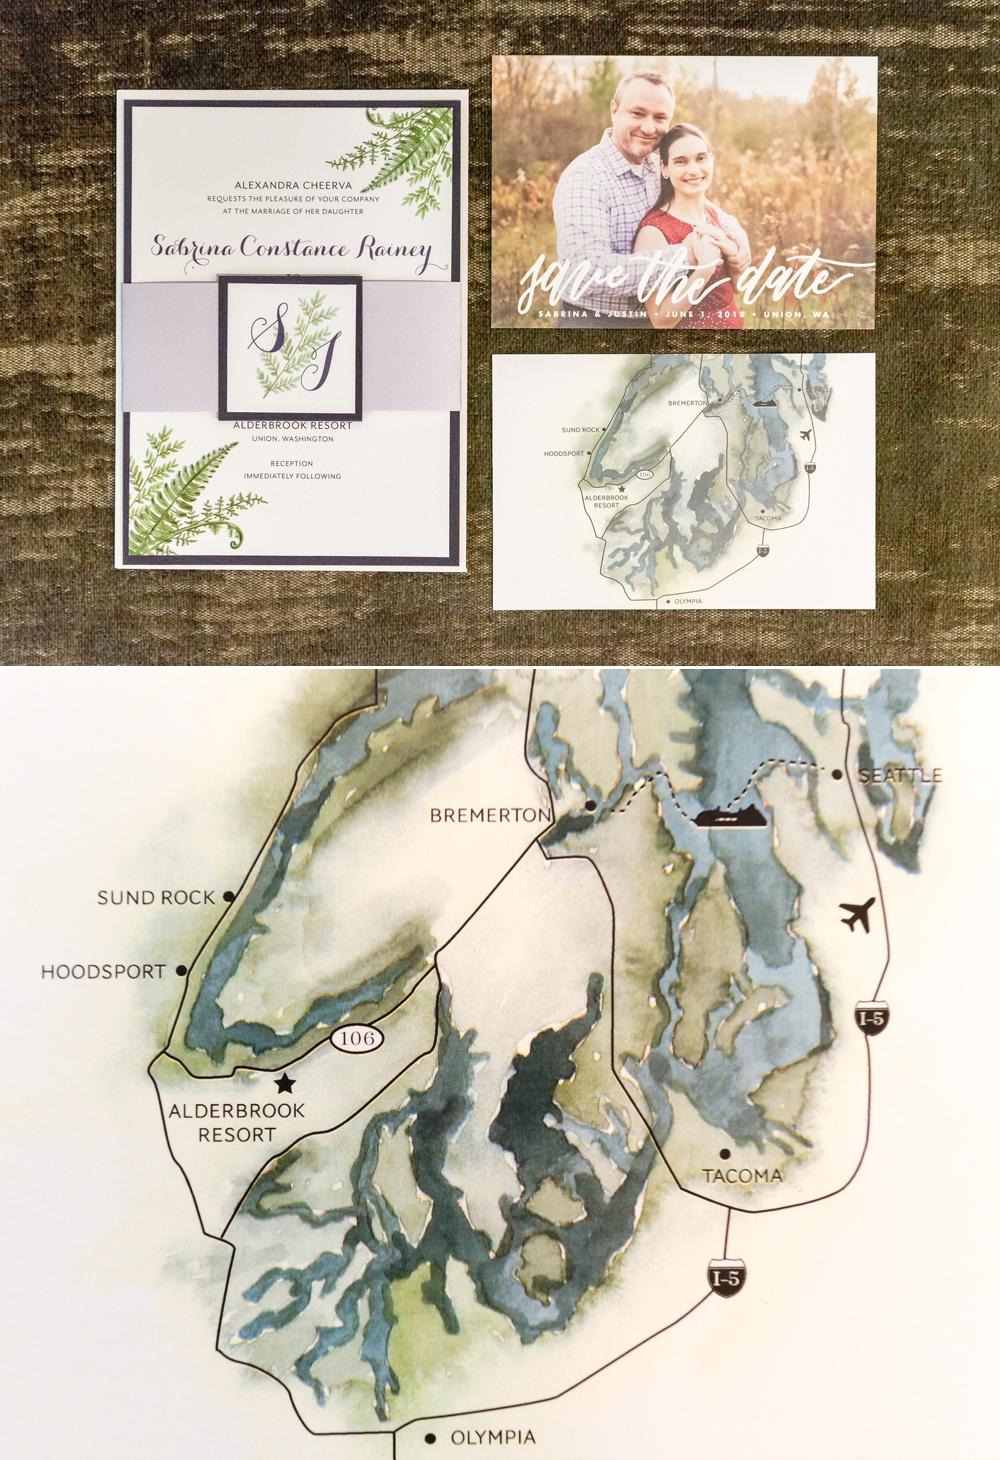 wedding-invitation-and-map-of-alderbrook